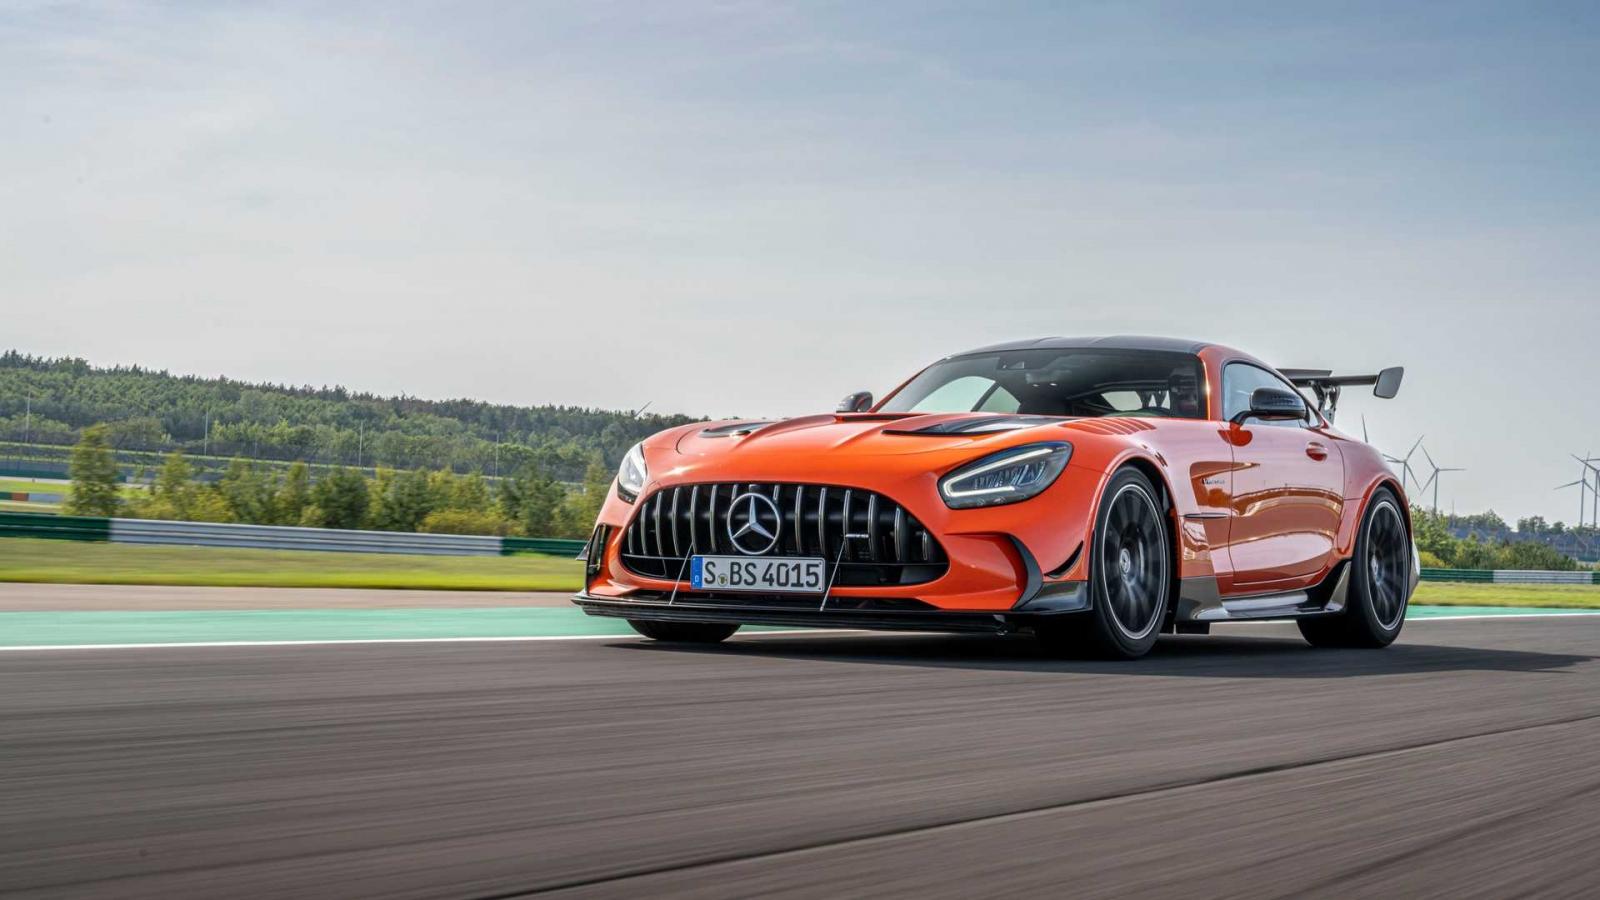 Khám phá Mercedes-Benz AMG GT Black Series giá hơn 300.000 USD